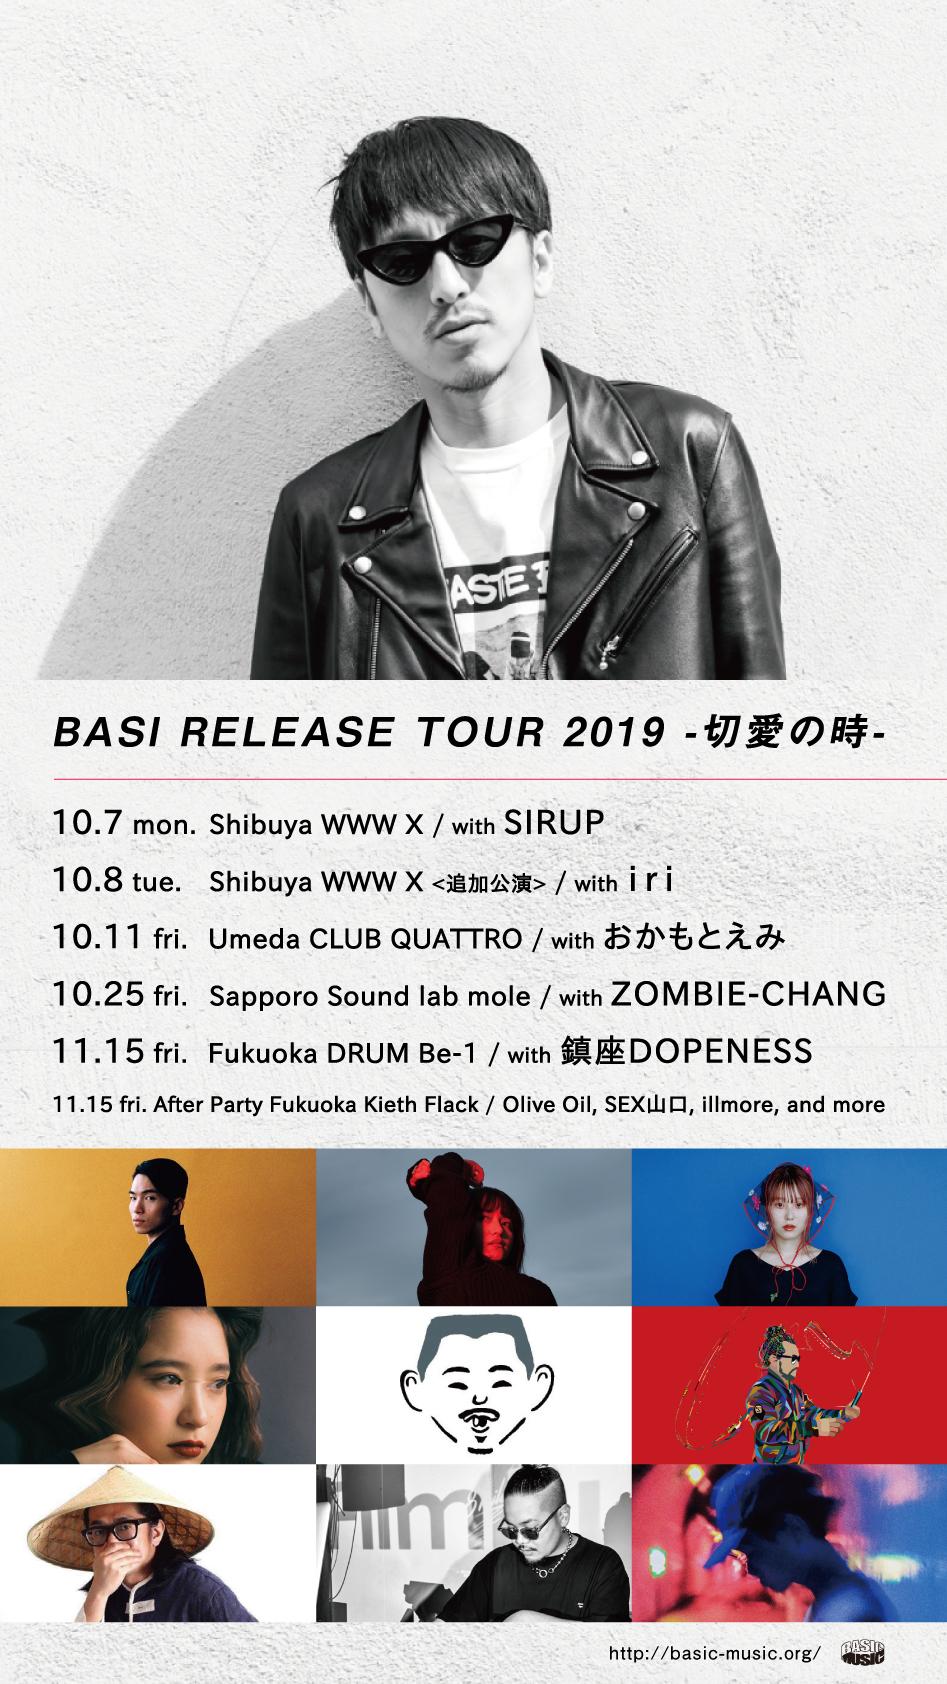 BASI RELEASE TOUR 2019 –切愛の時– in FUKUOKA